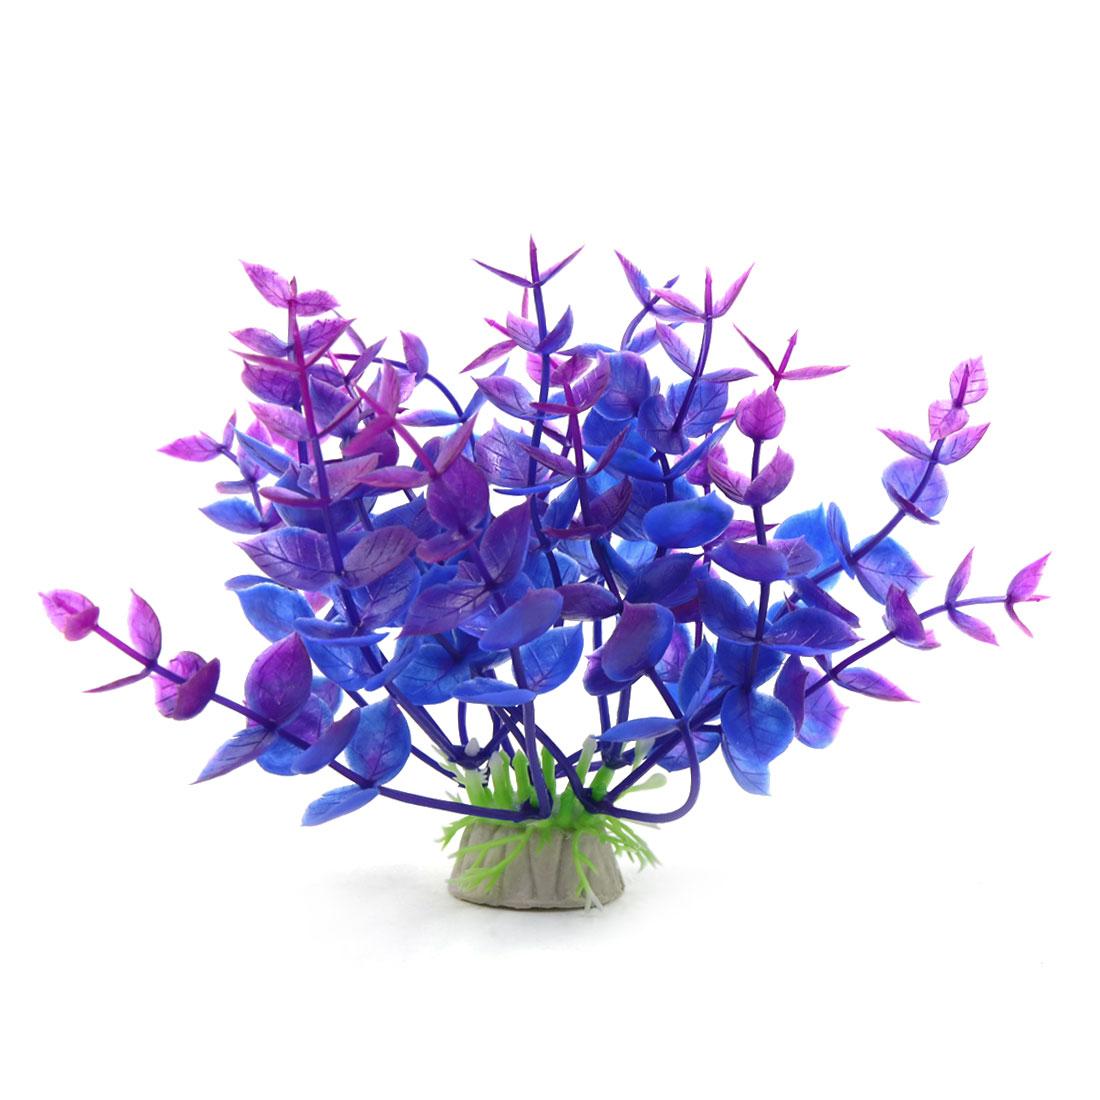 Purple Plastic Plant Aquarium Landscape Decorative Ornament w/ Ceramic Base